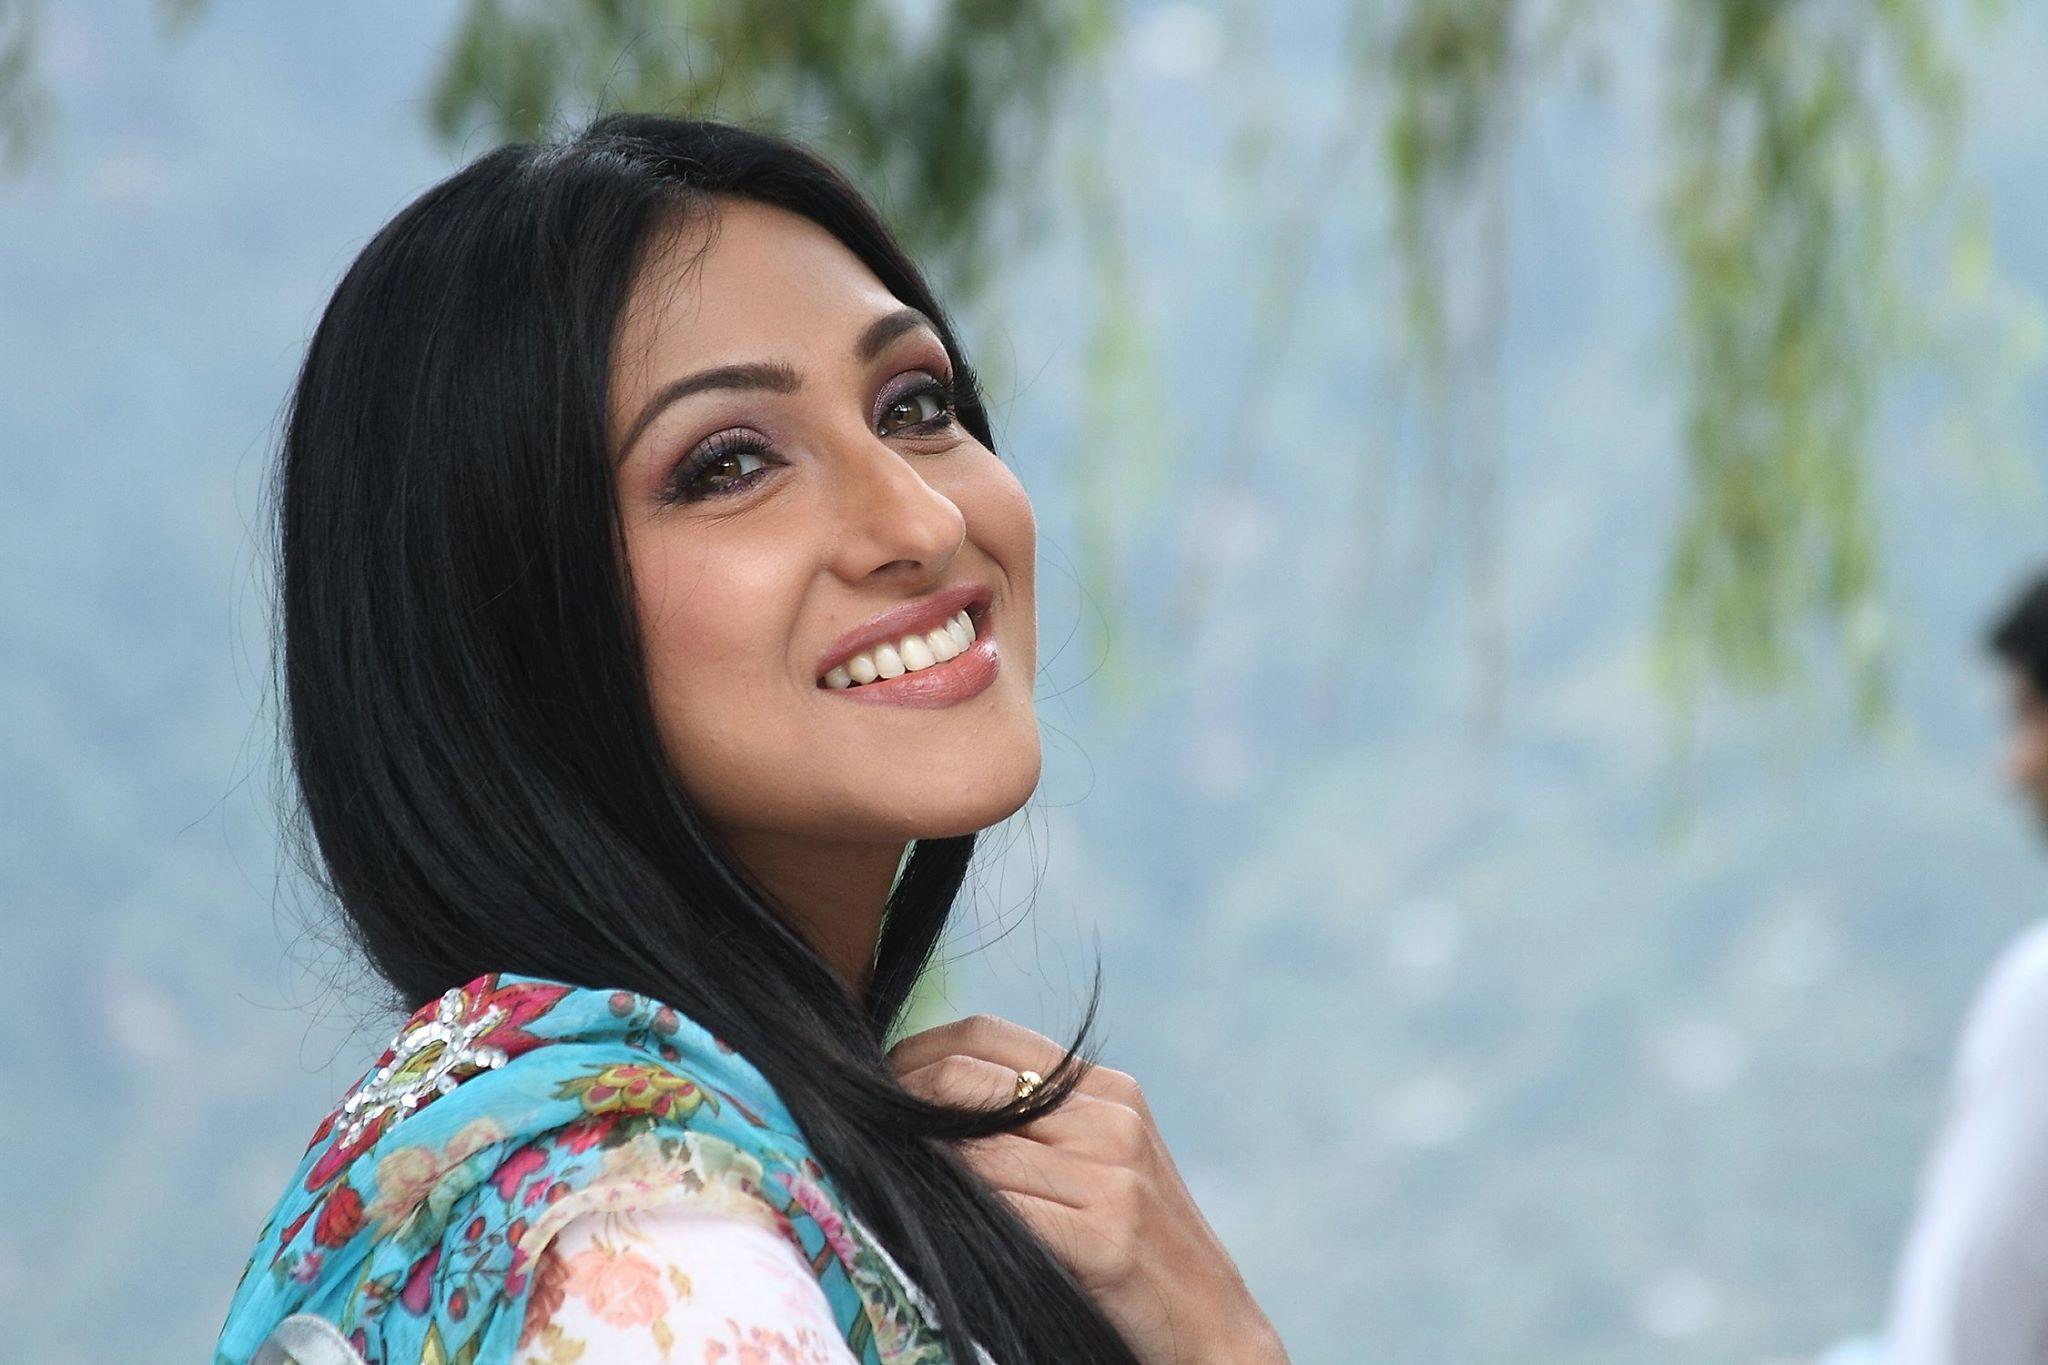 After Tolly actor Prosenjit, ED summons actress Rituparna Sengupta to face investigating agency on Rose Valley scamAfter Tolly actor Prosenjit, ED summons actress Rituparna Sengupta to face investigating agency on Rose Valley scam